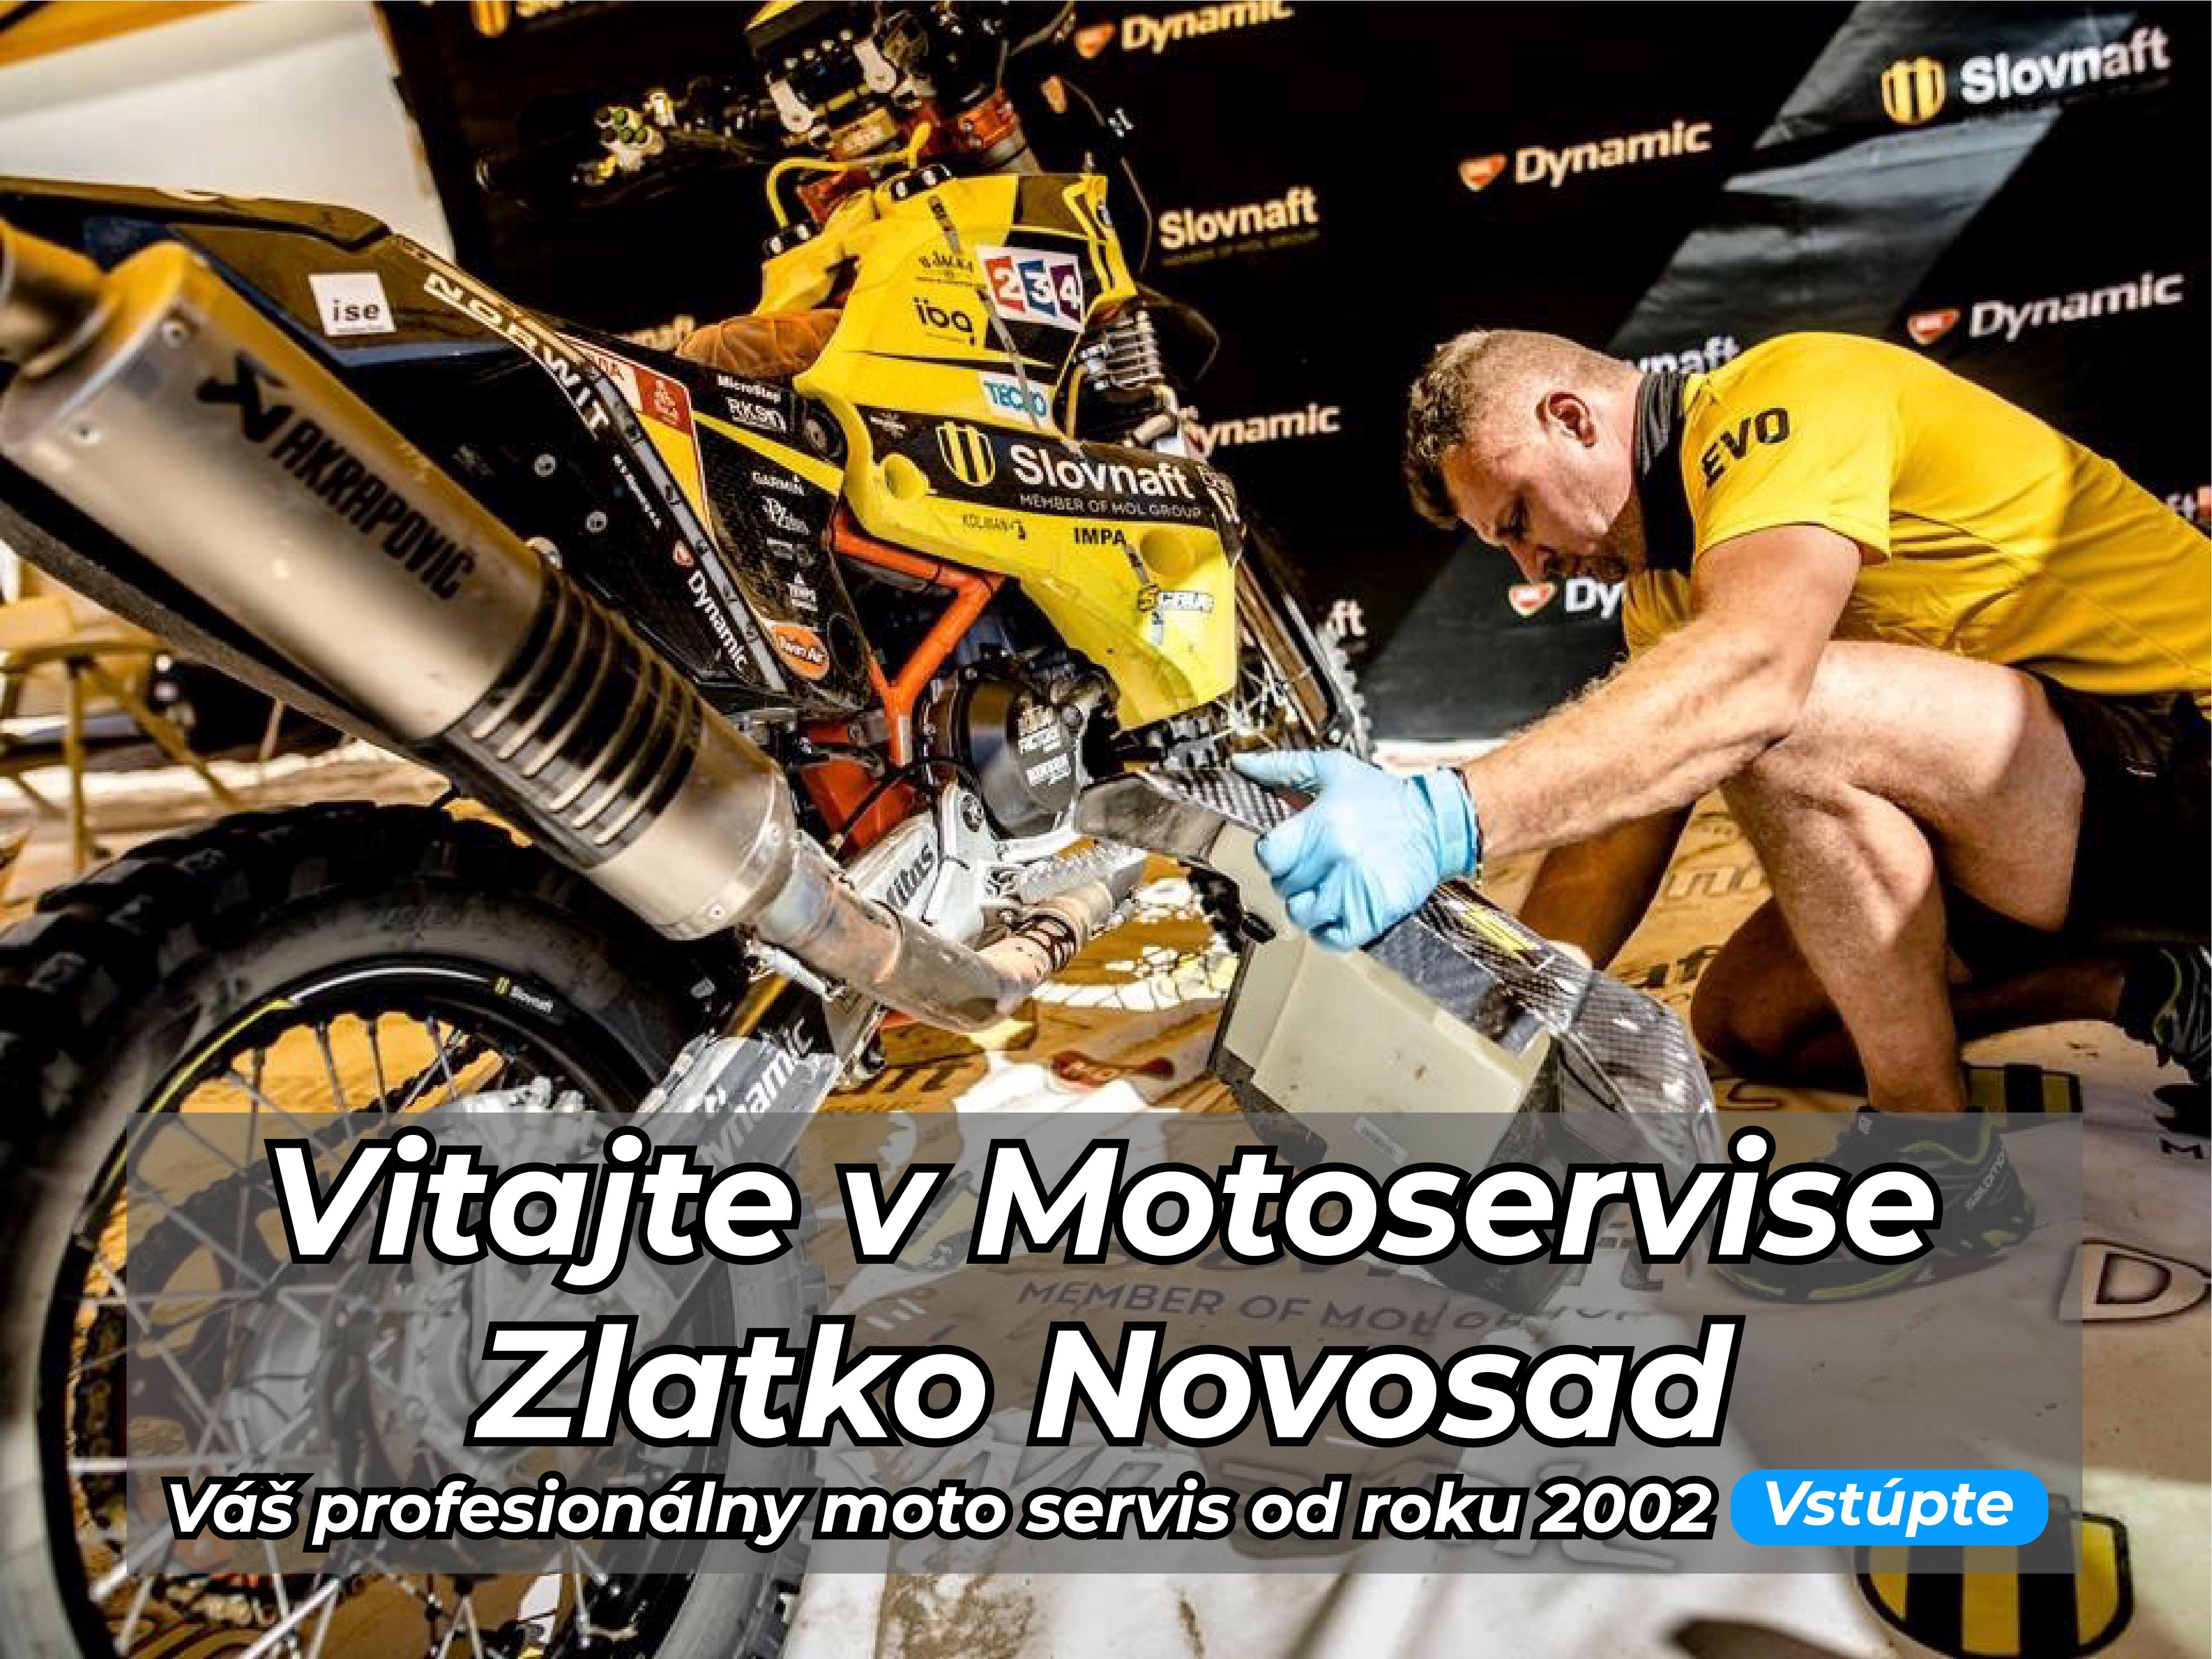 b3021b9c2a759 - MOTOSERVIS NOVOSAD